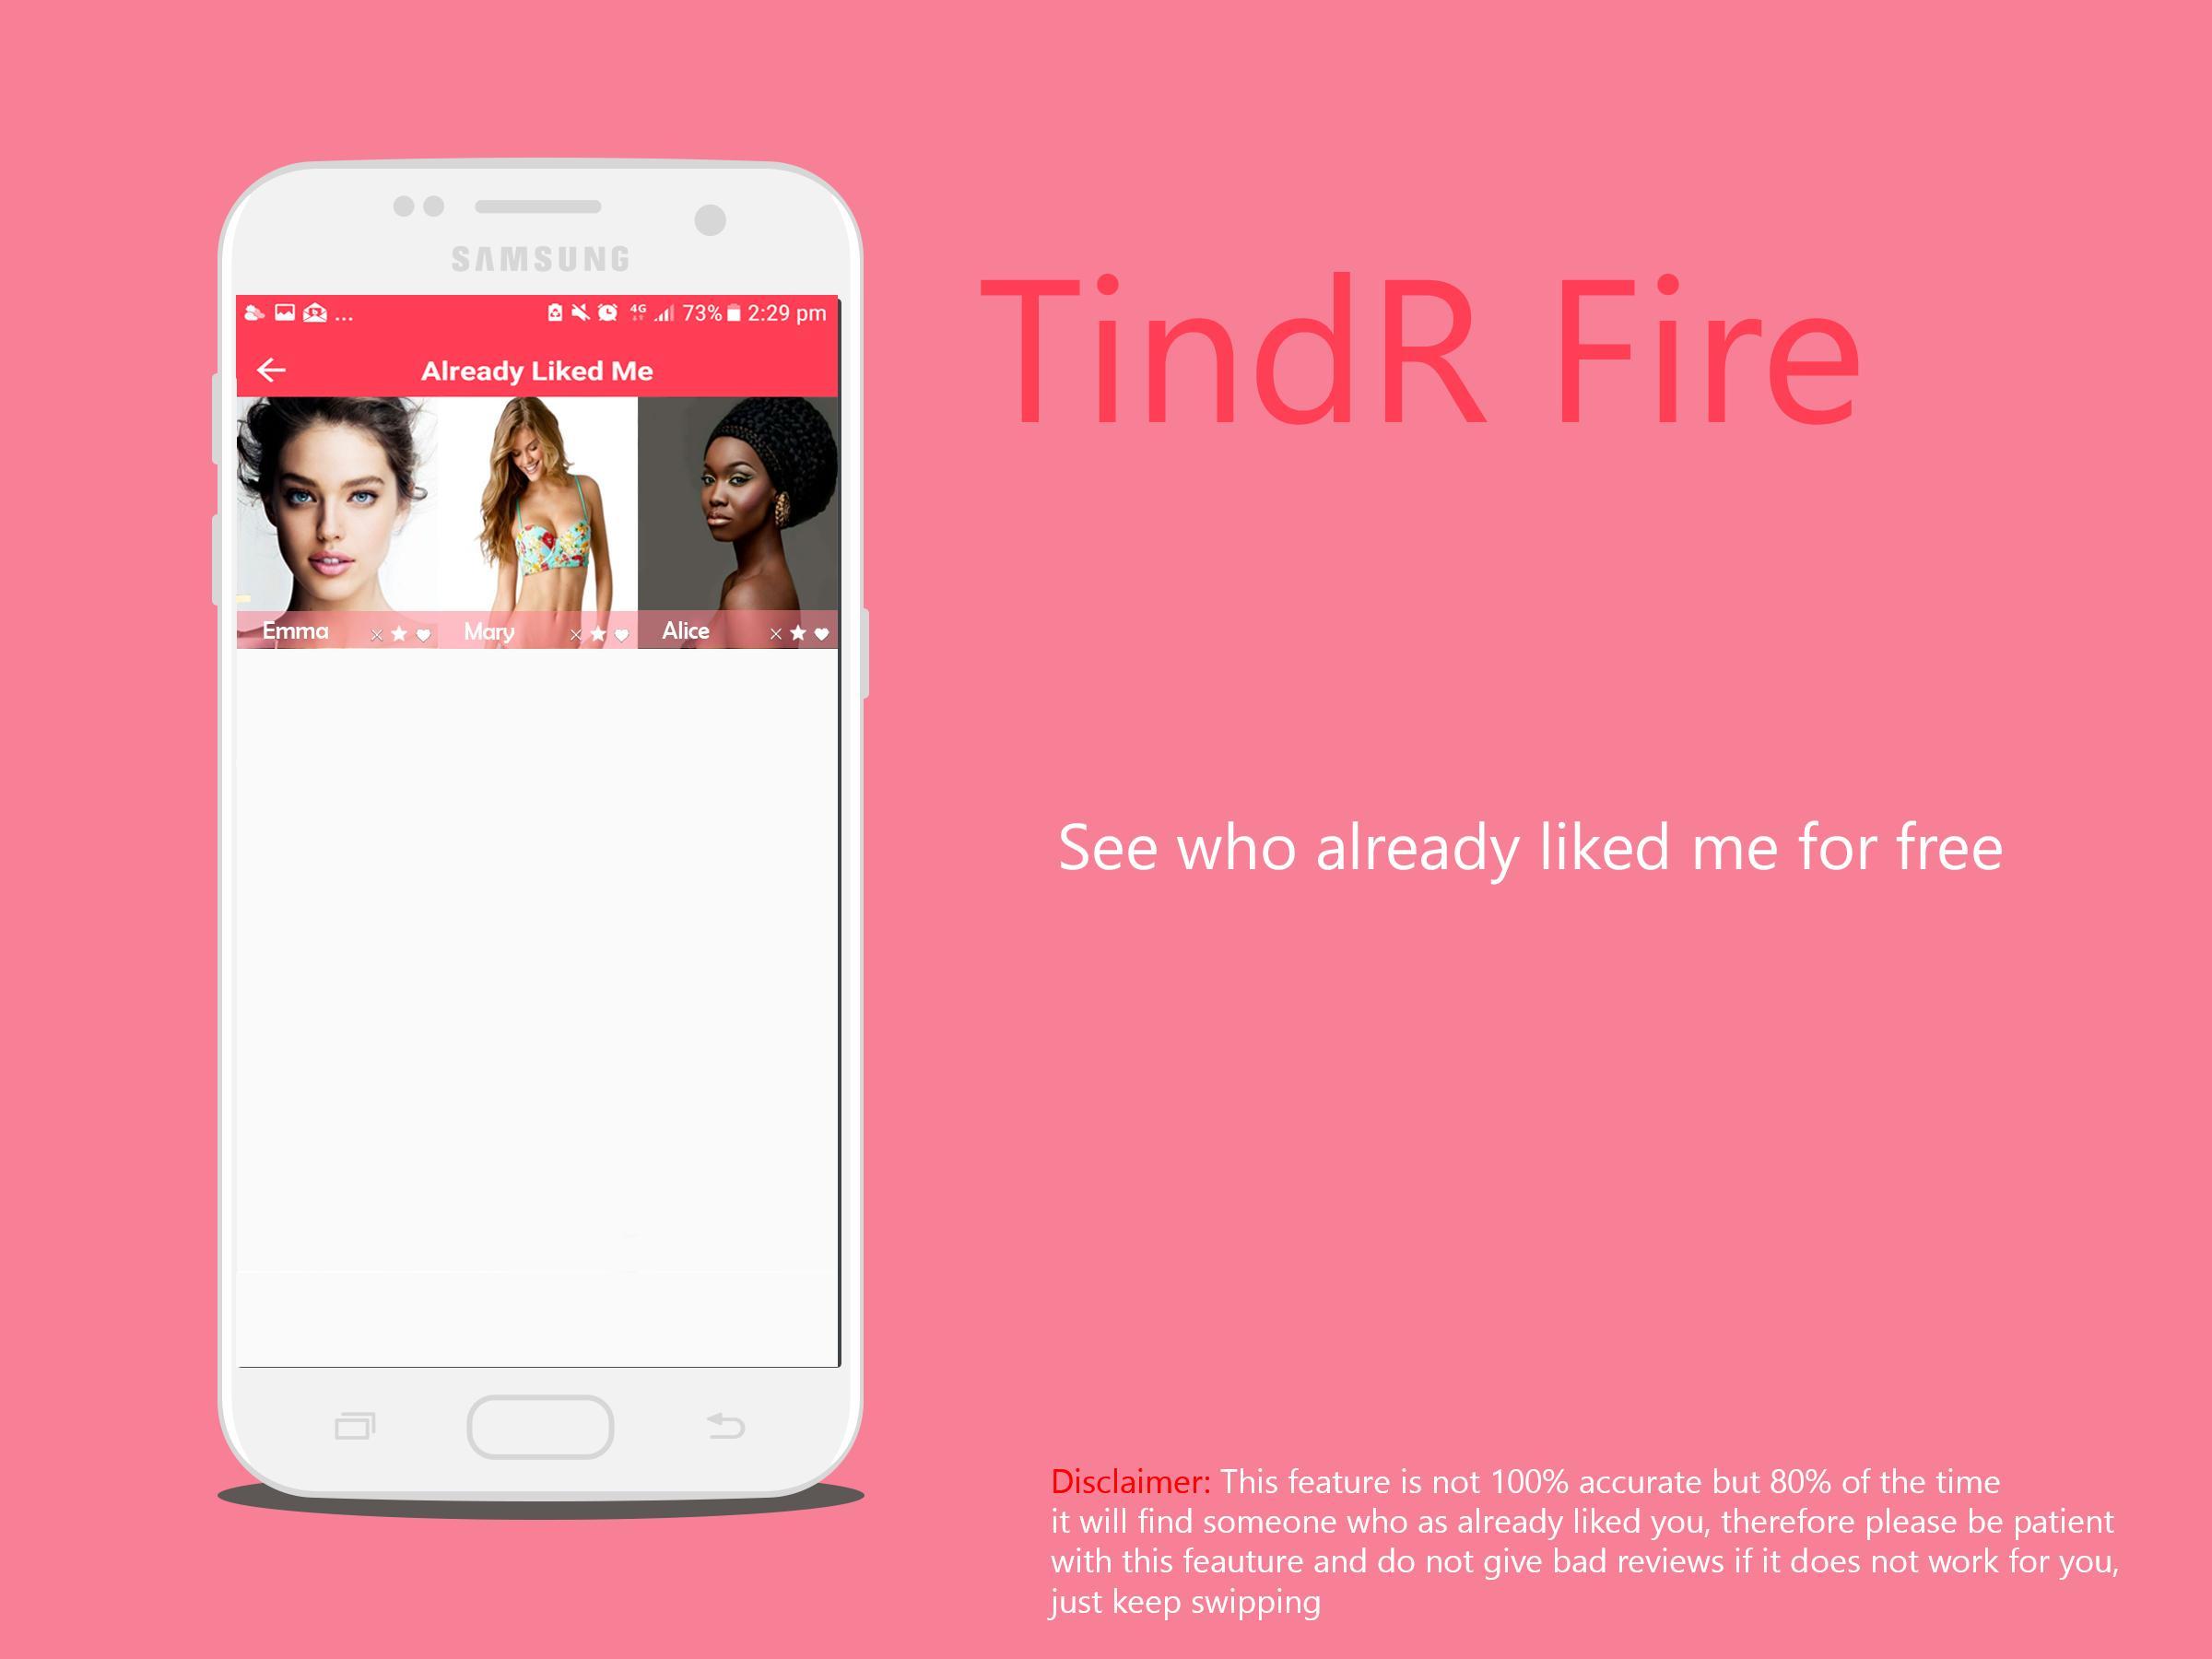 Android bonfire apk tinder for iHackedit